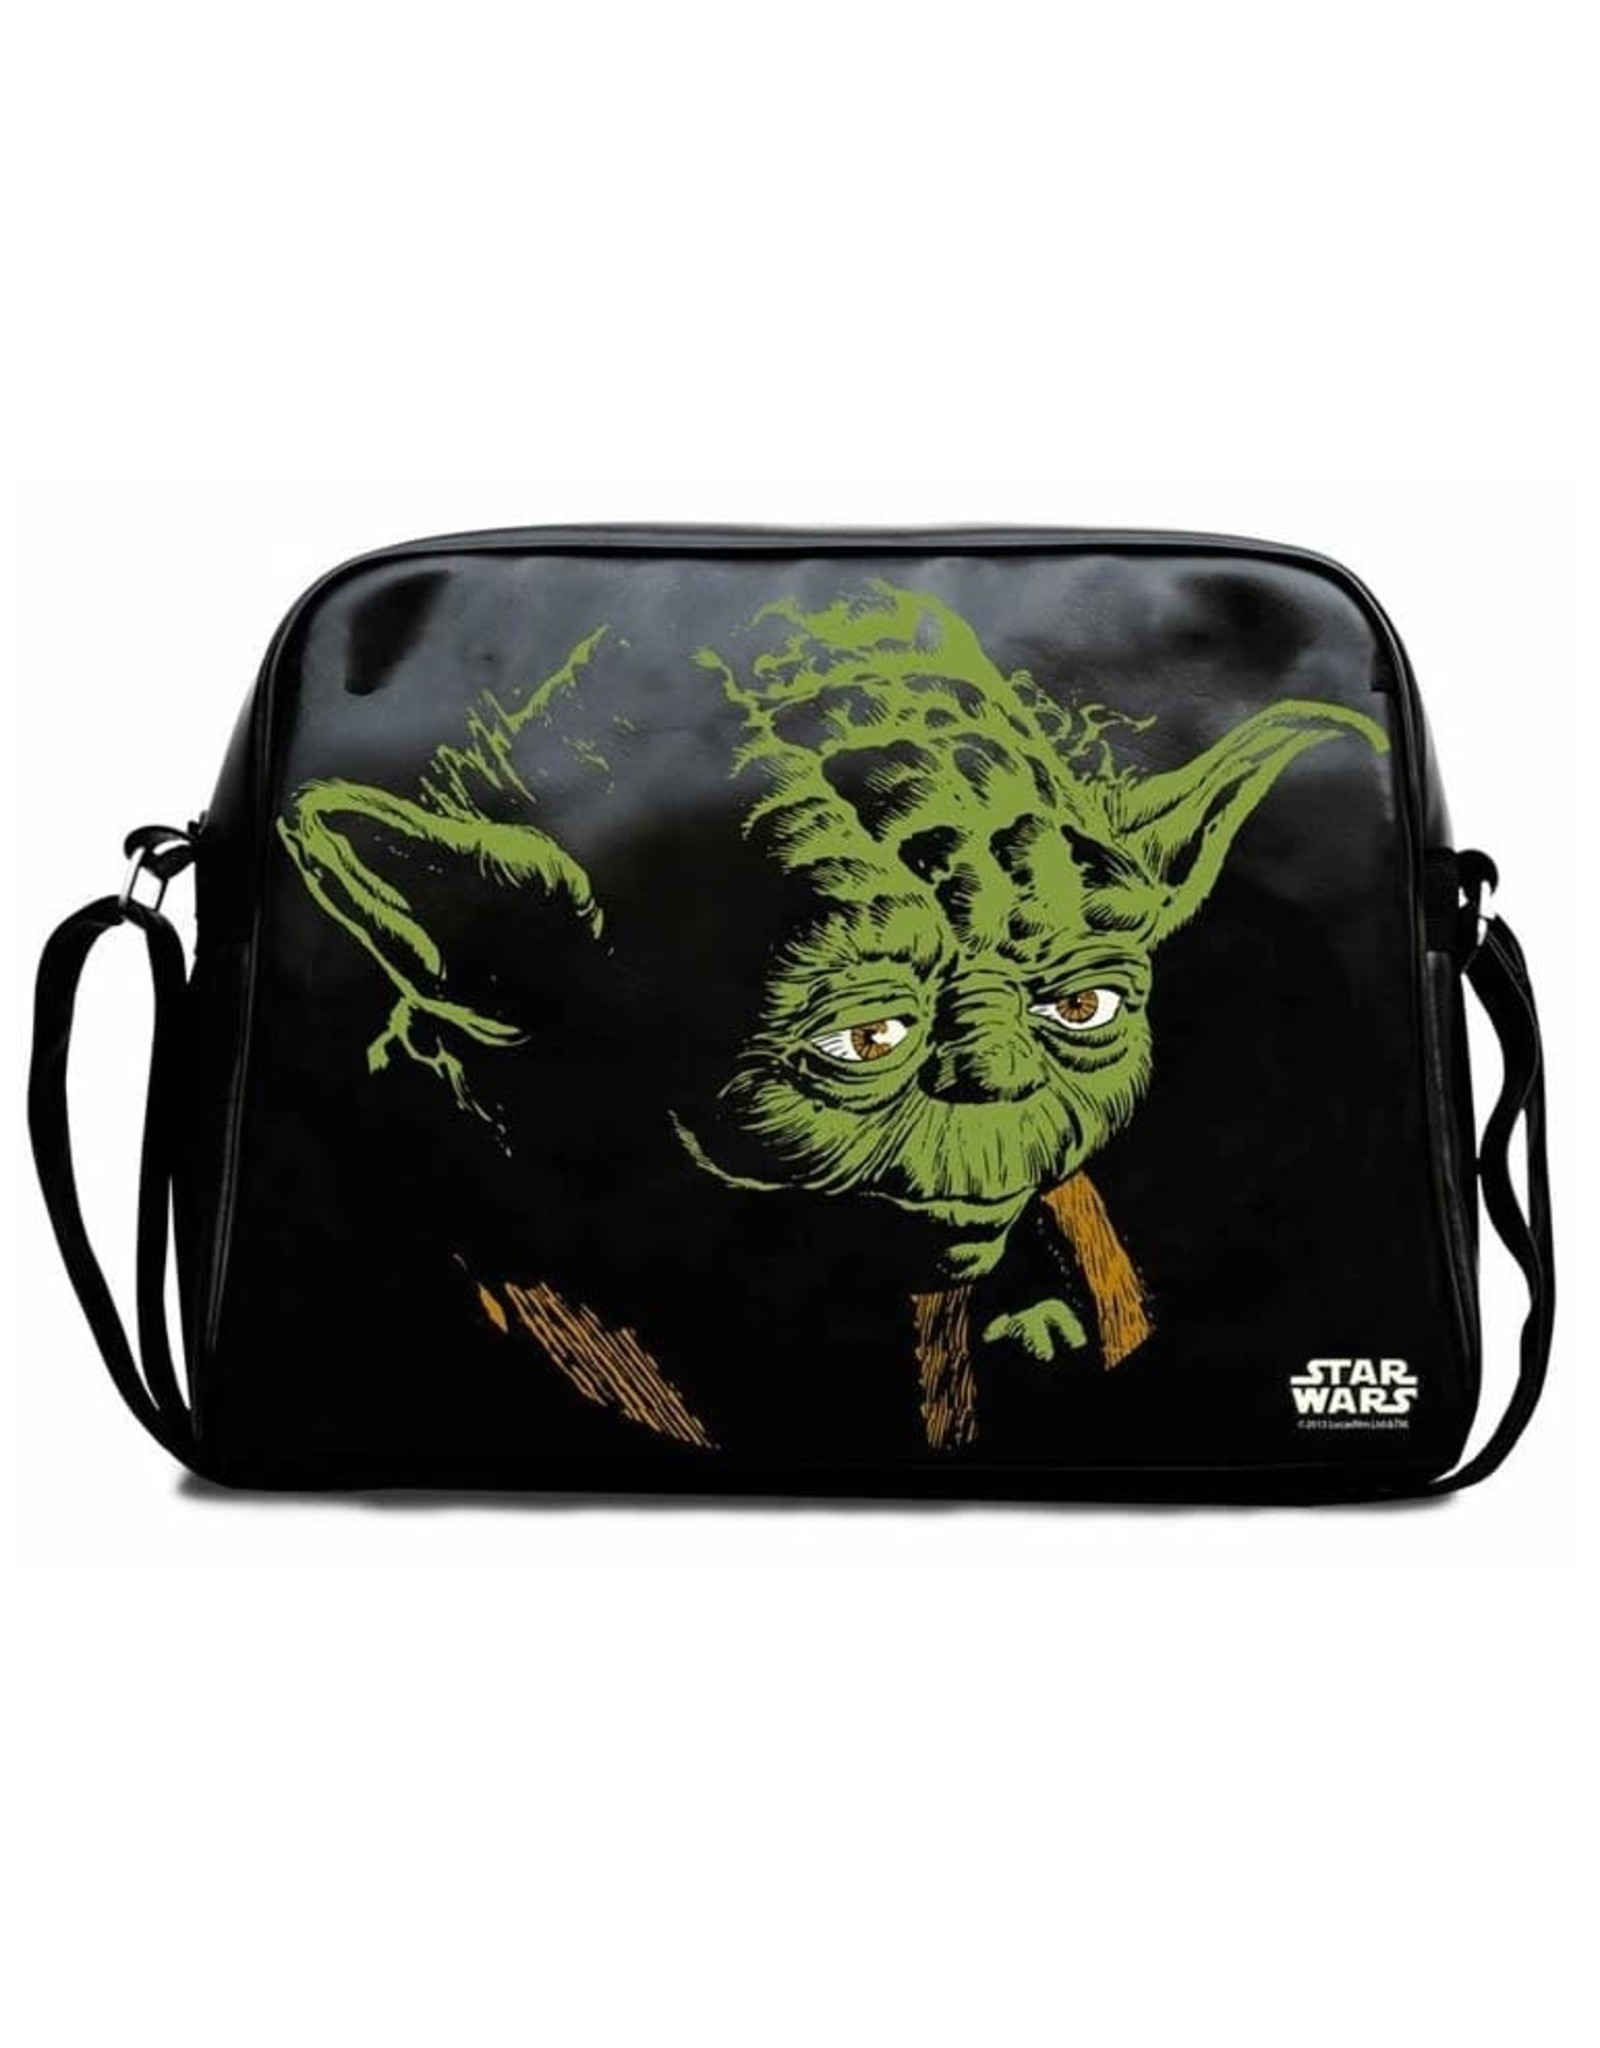 Star Wars Star Wars messenger tas Yoda retro